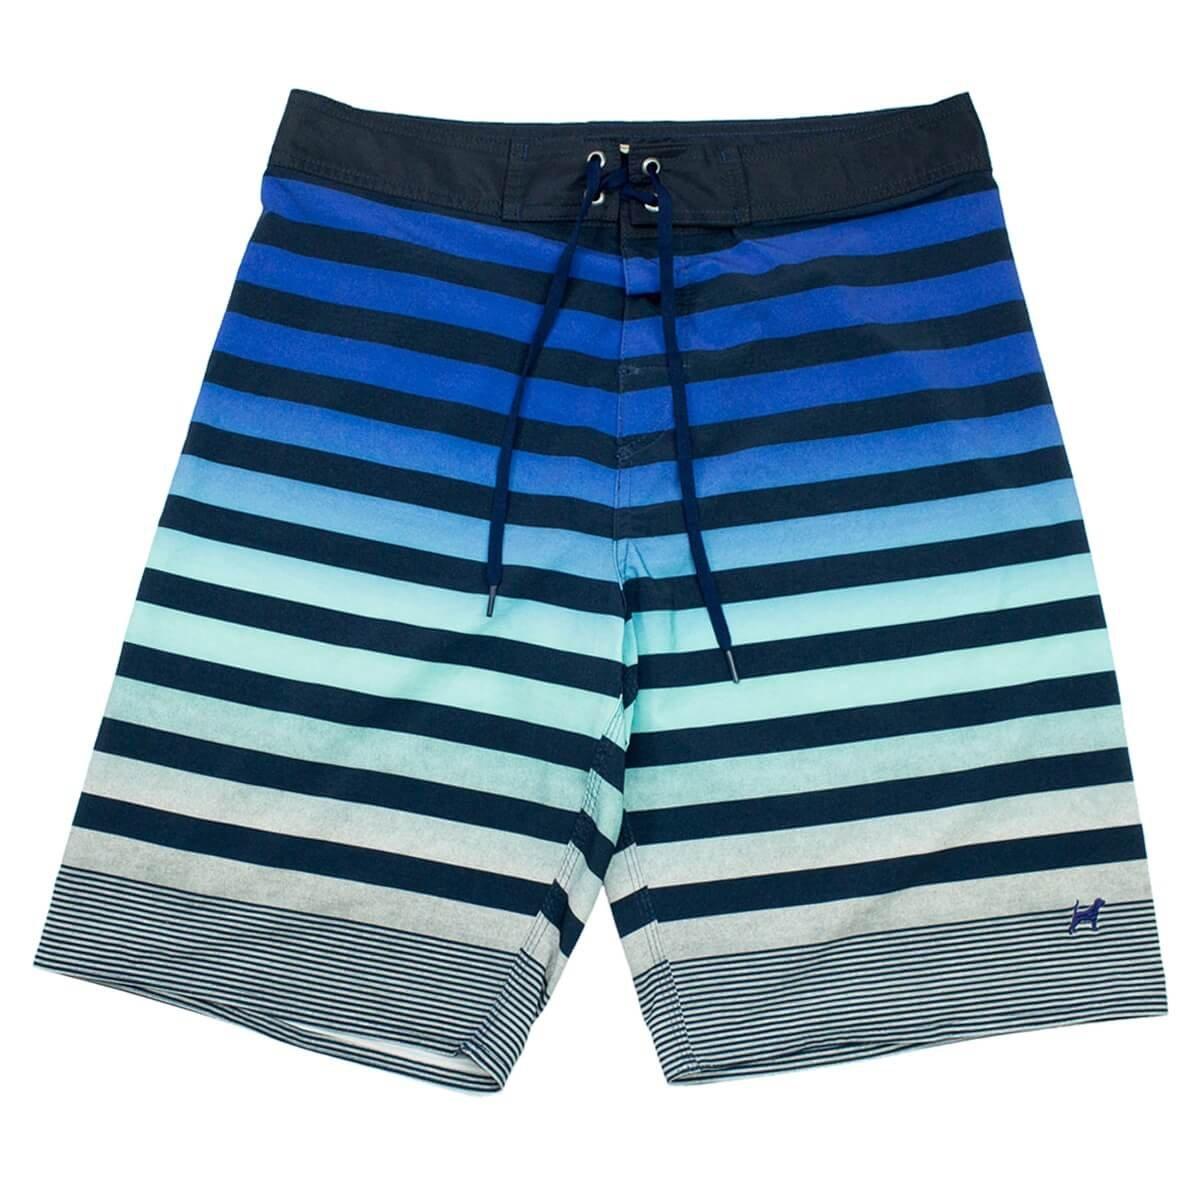 5df87fc6e Bizz store - Shorts Masculino Beagle